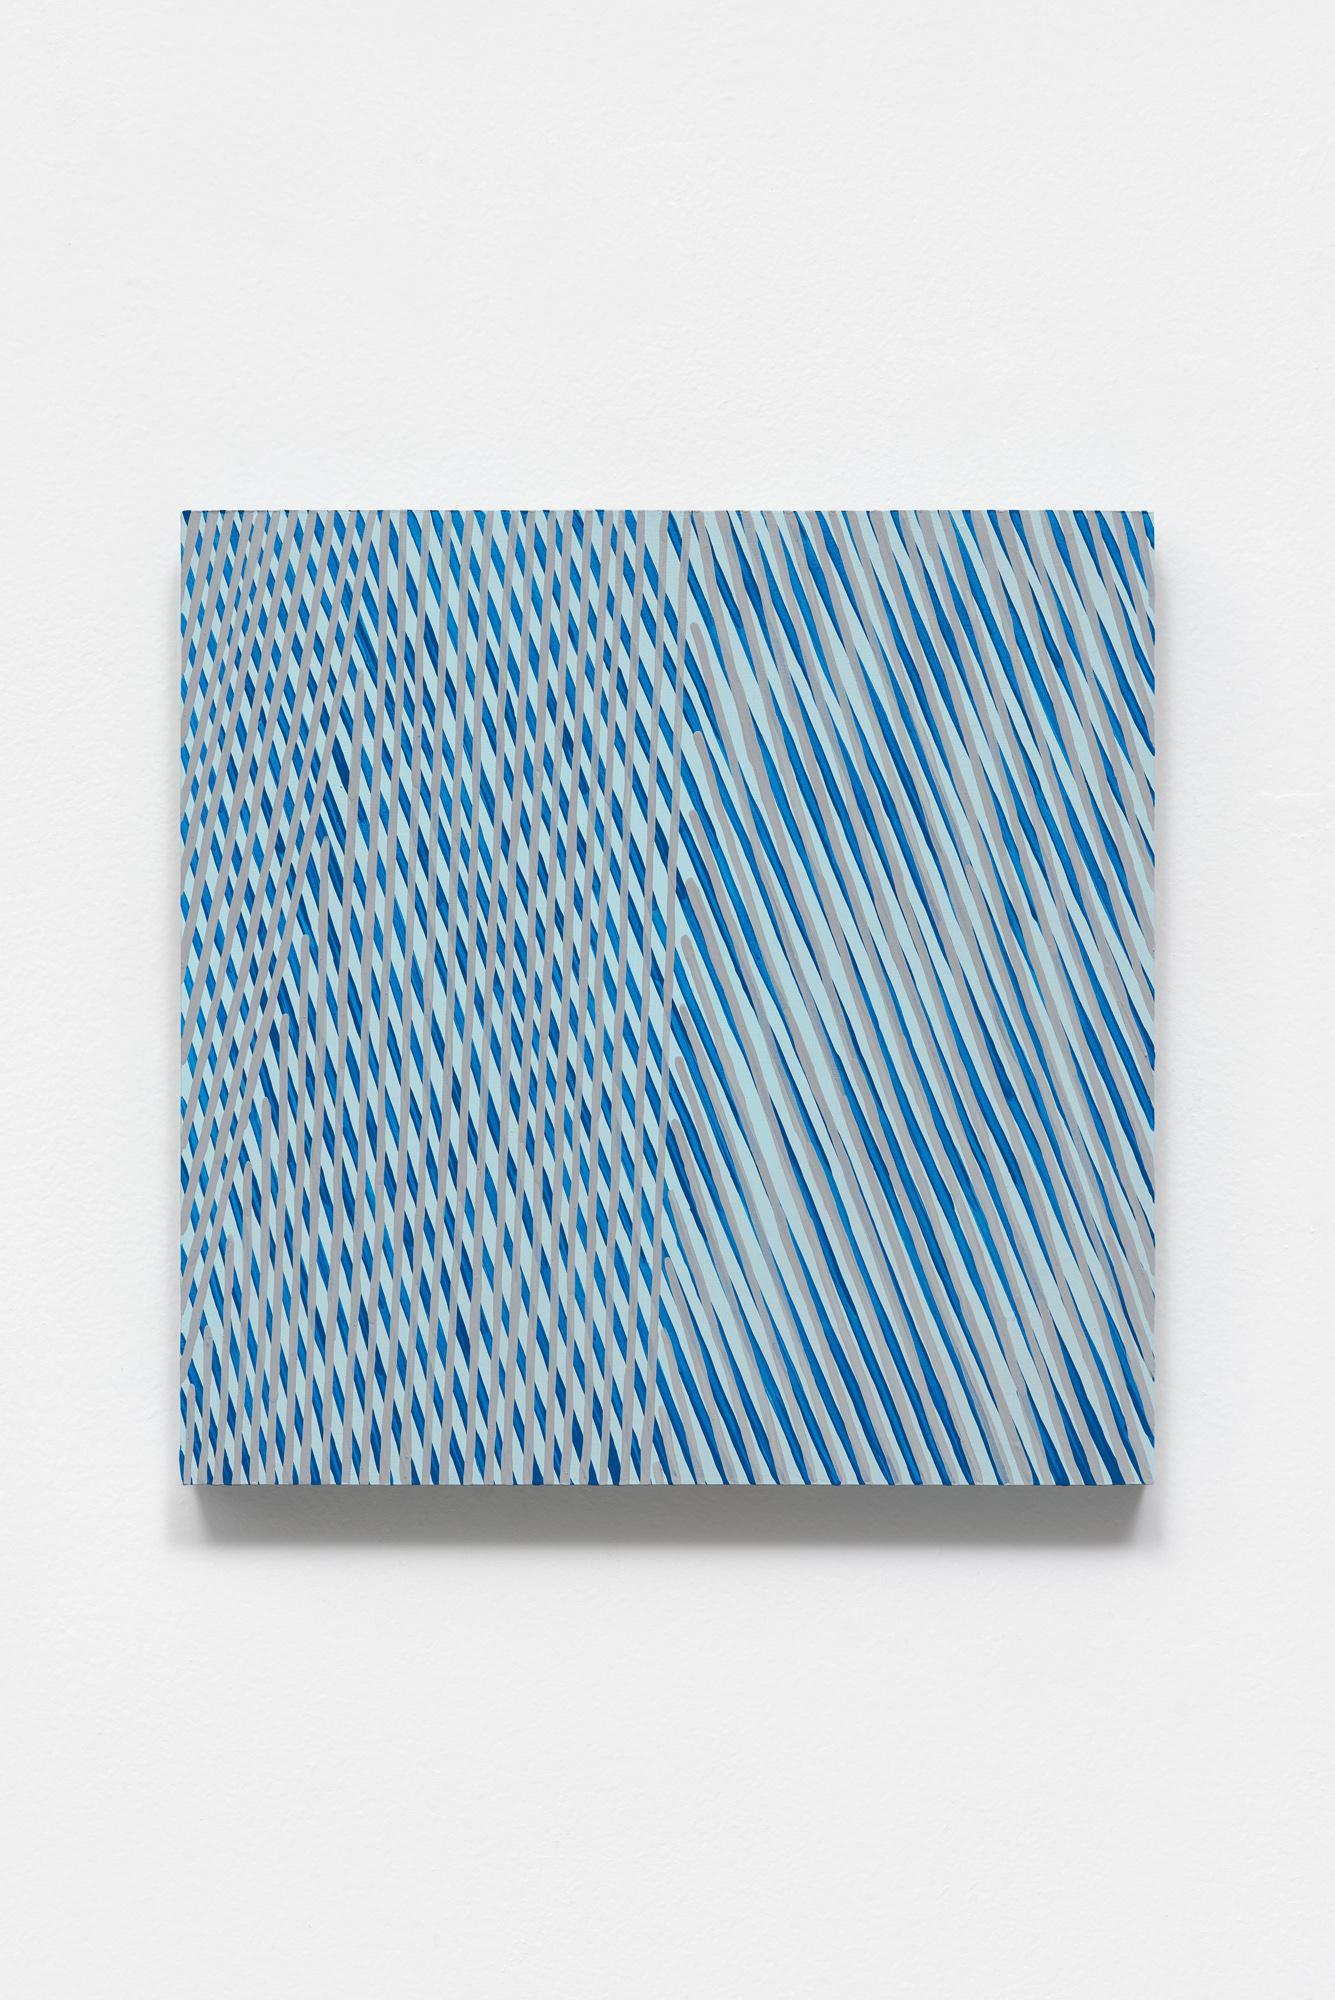 Untitled (maraca), blue abstract optical painting, acrylic on panel, 2020